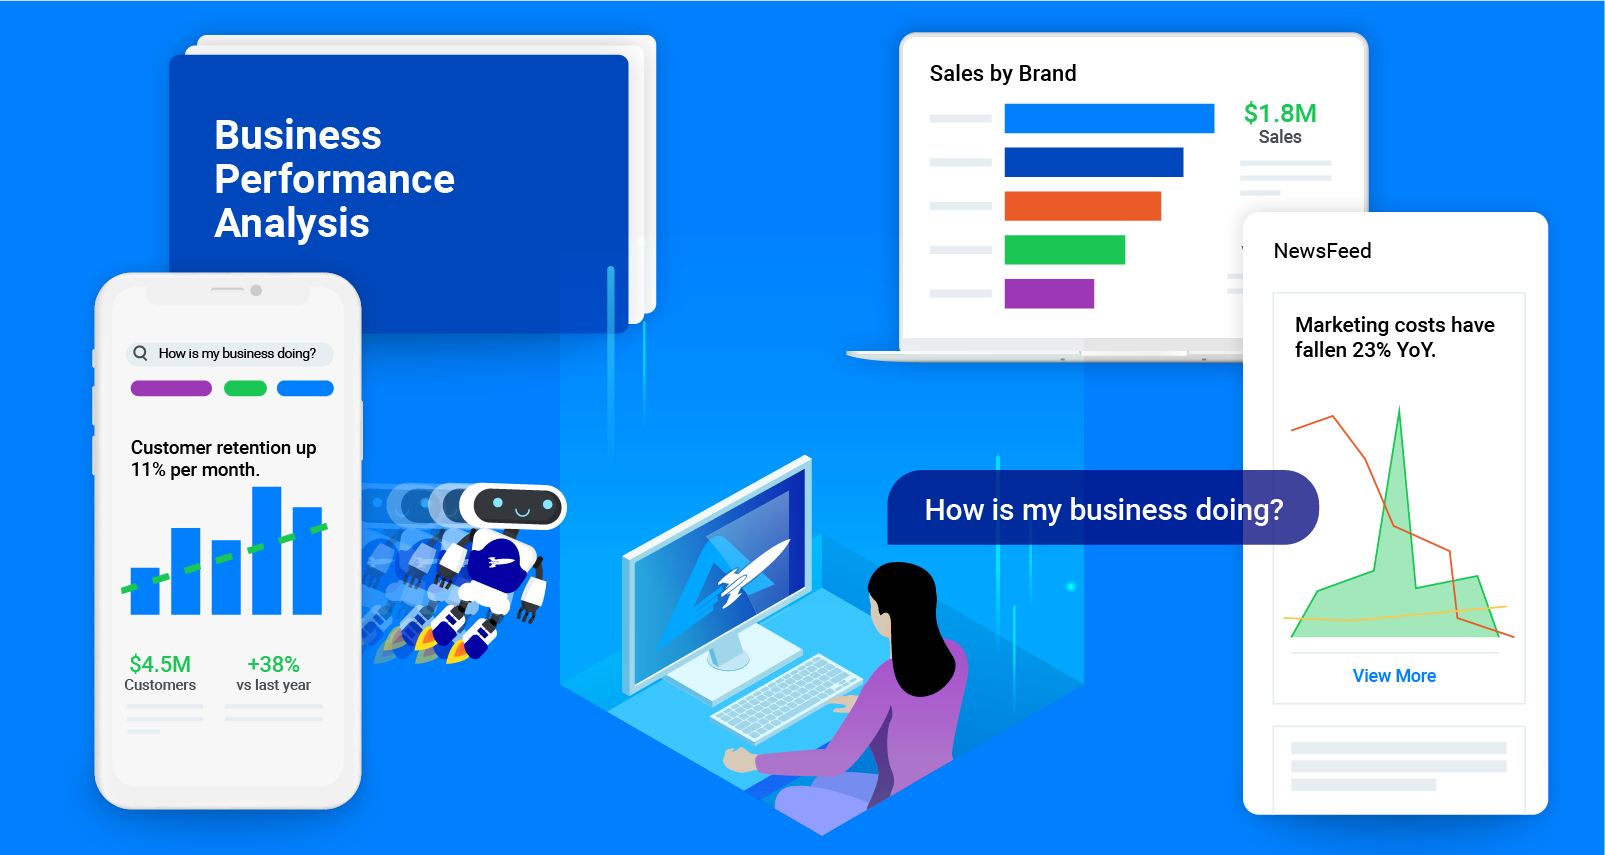 AnswerRocket enables brand performance analysis